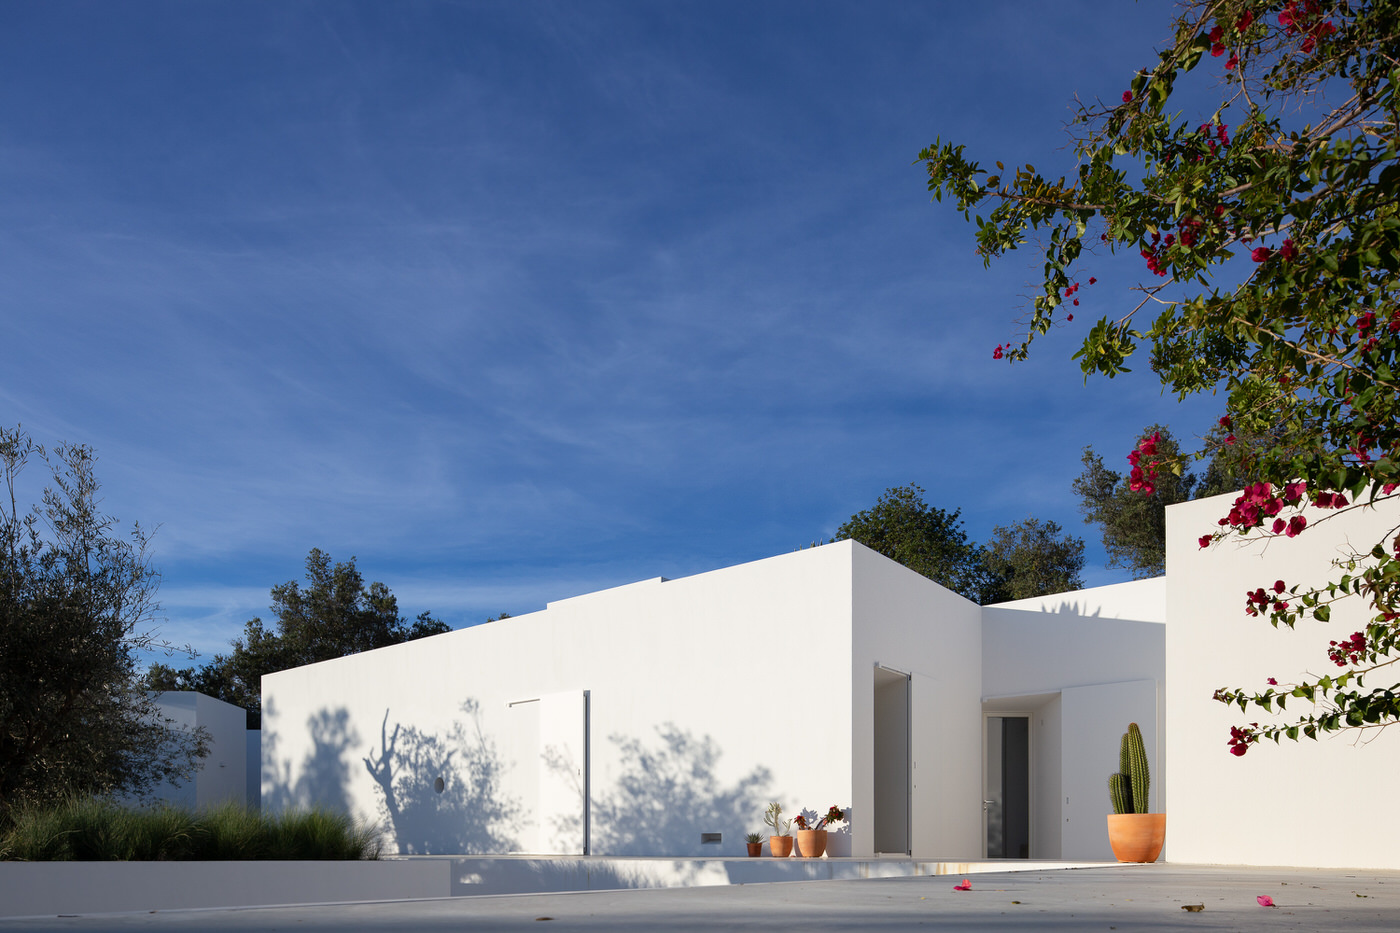 Zalig-Algarve-Casa-Luum-234-1_1